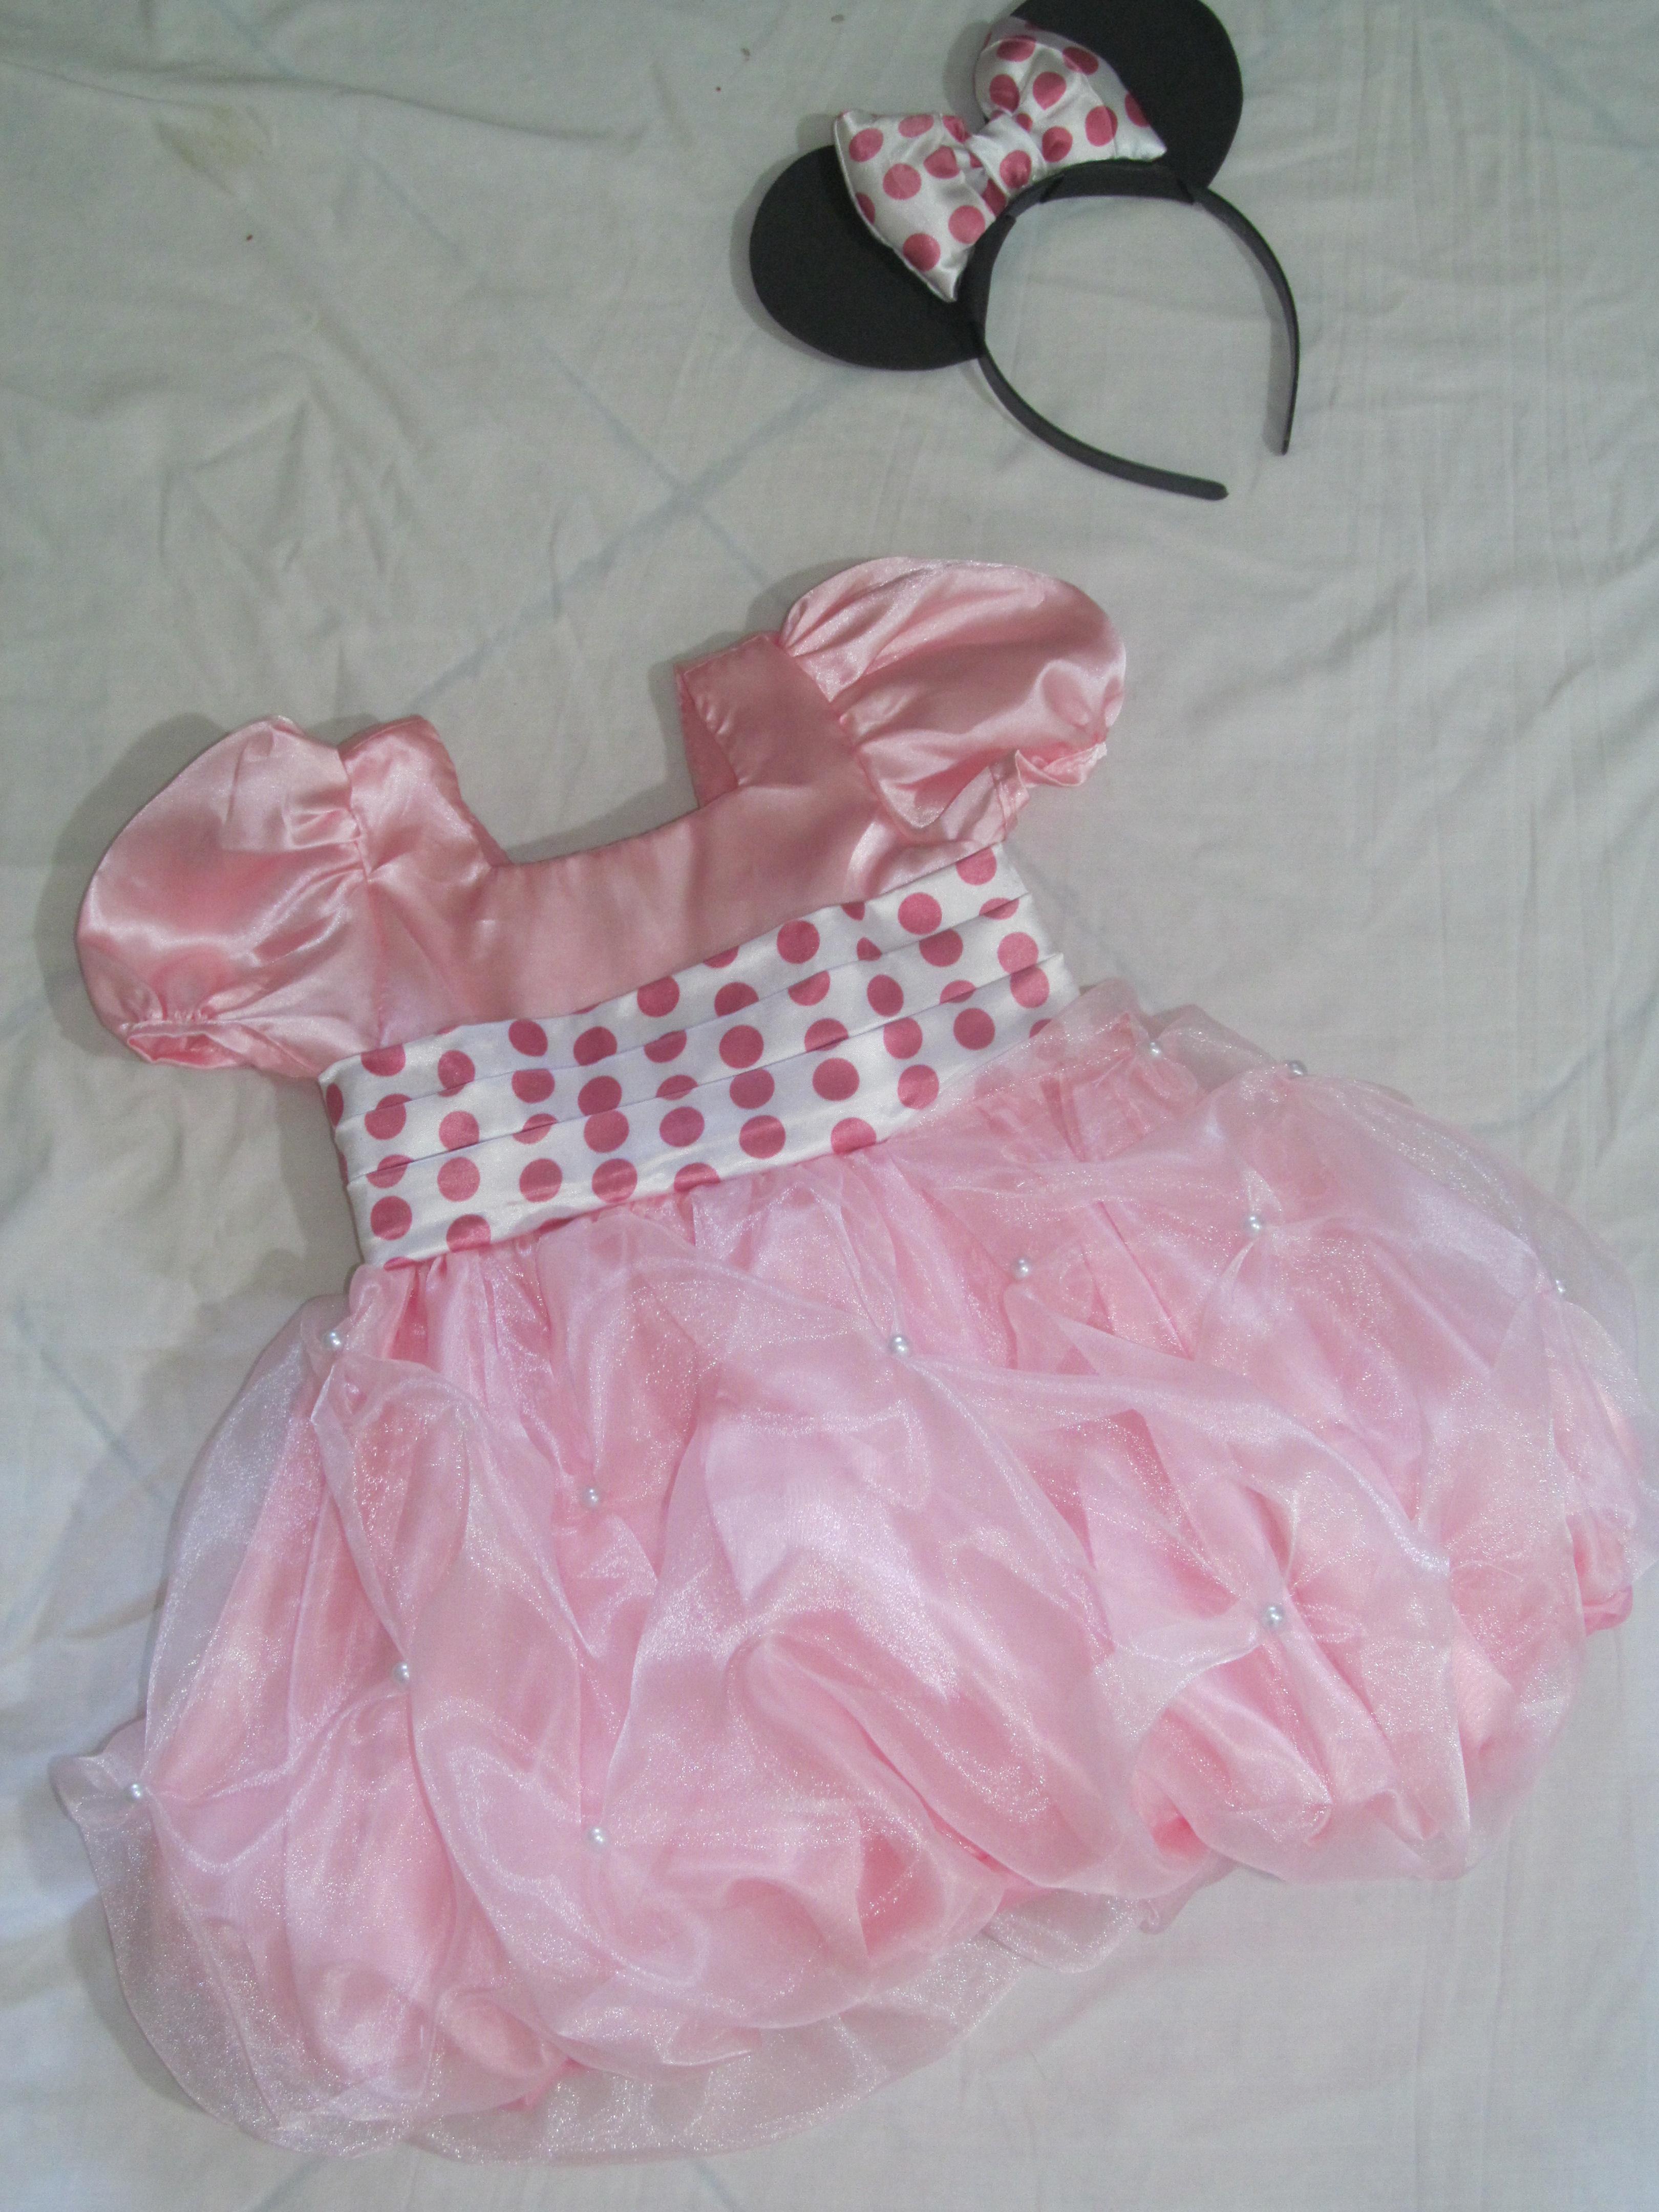 ... mae-e-filha-da-minnie-rosa-festa vestido-mae-e-filha-da-minnie-rosa